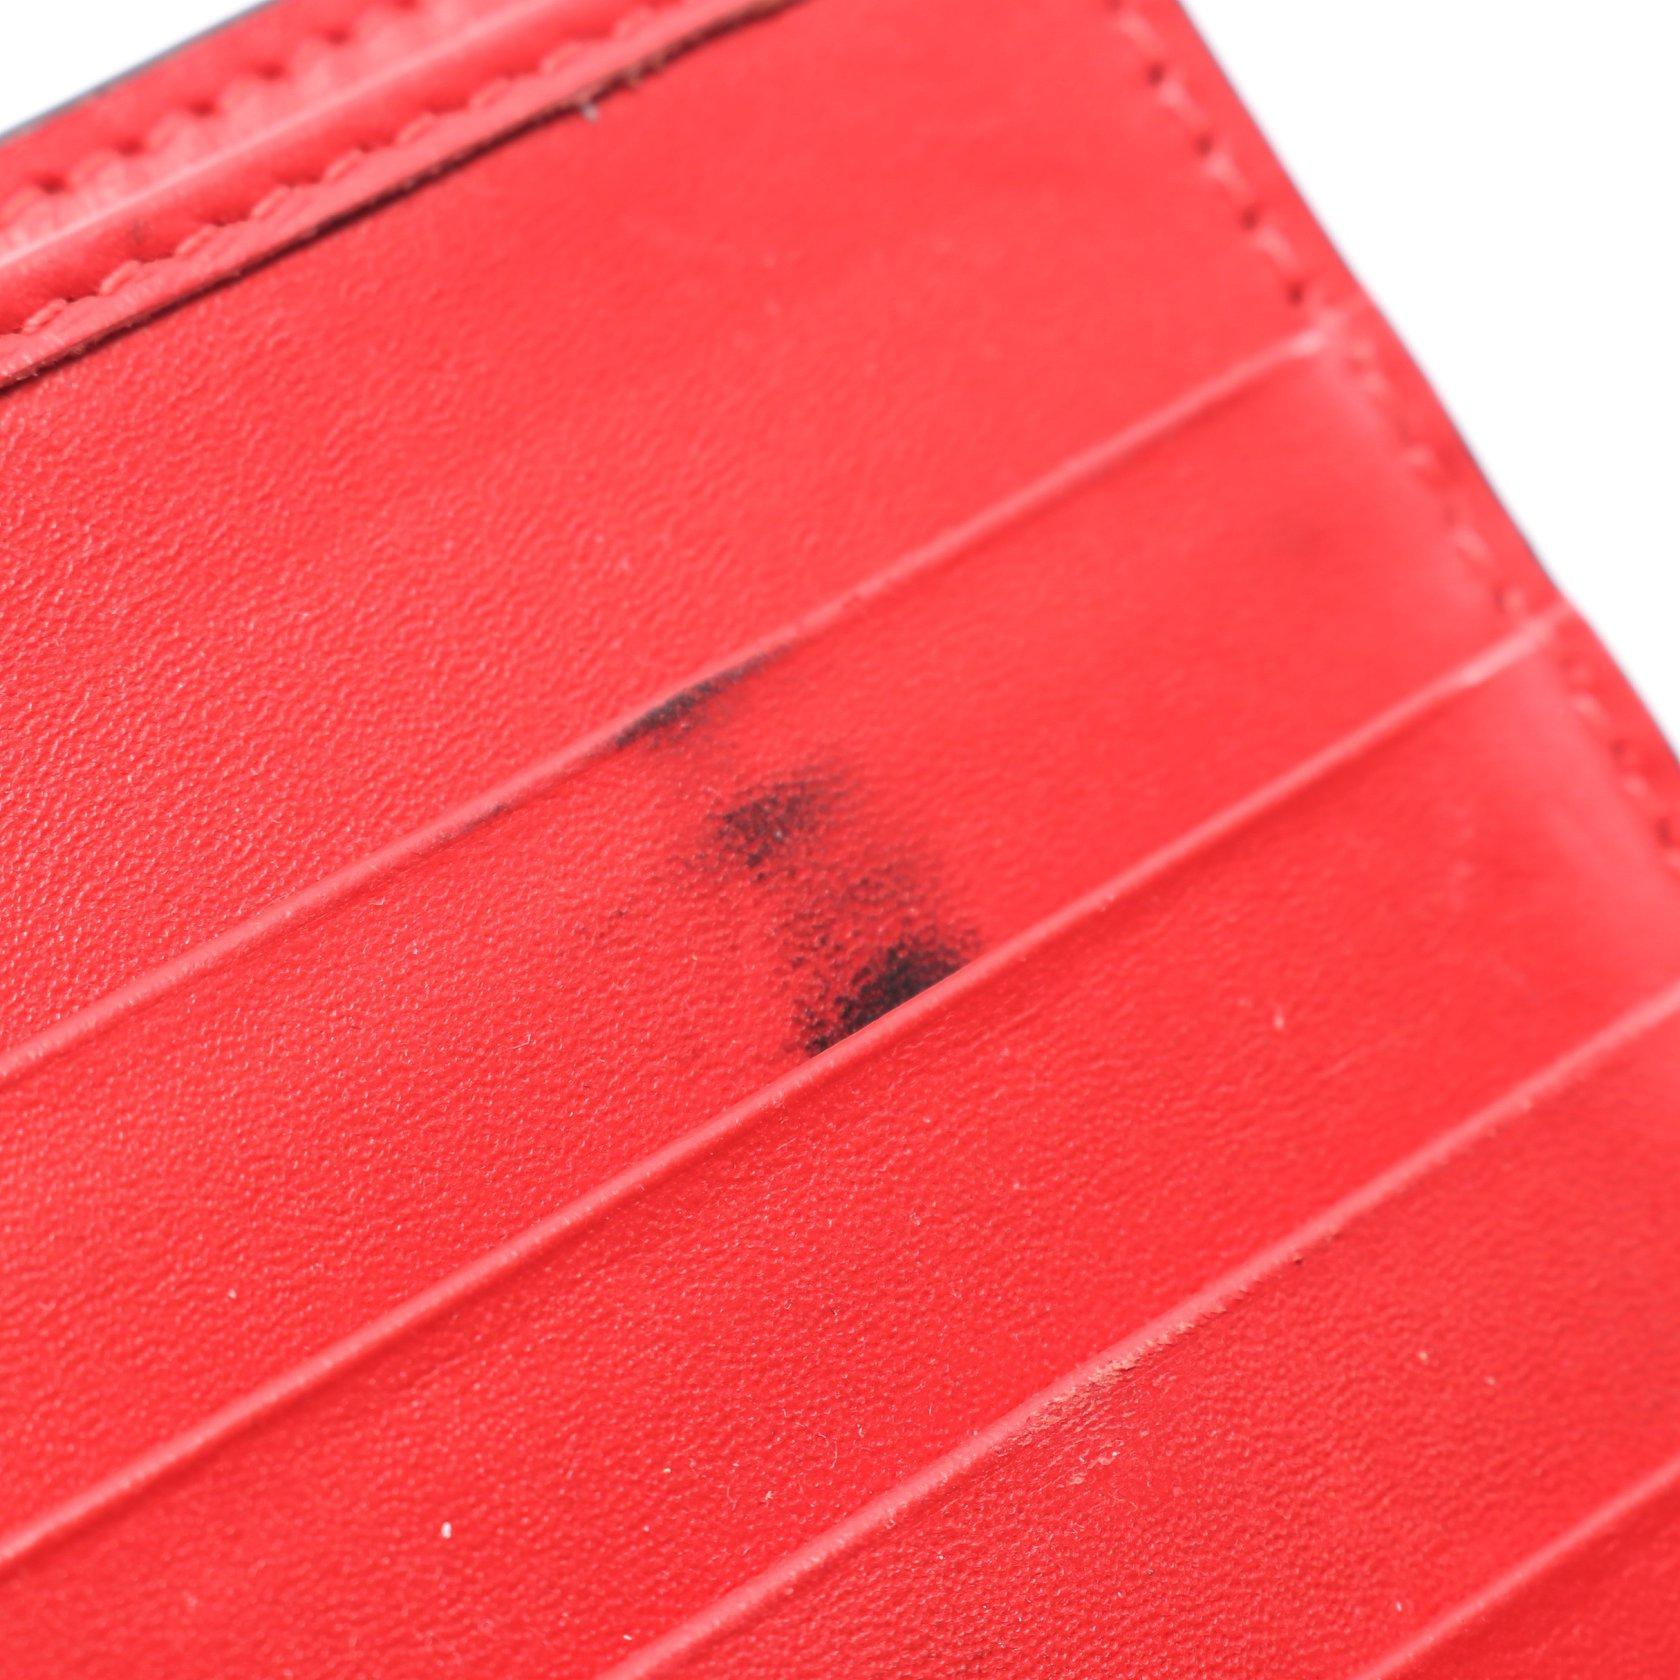 Christian Louboutin・財布・小物・Paloma Wallet パロマ 二つ折り長財布 レザー ラバー ブラック レッド